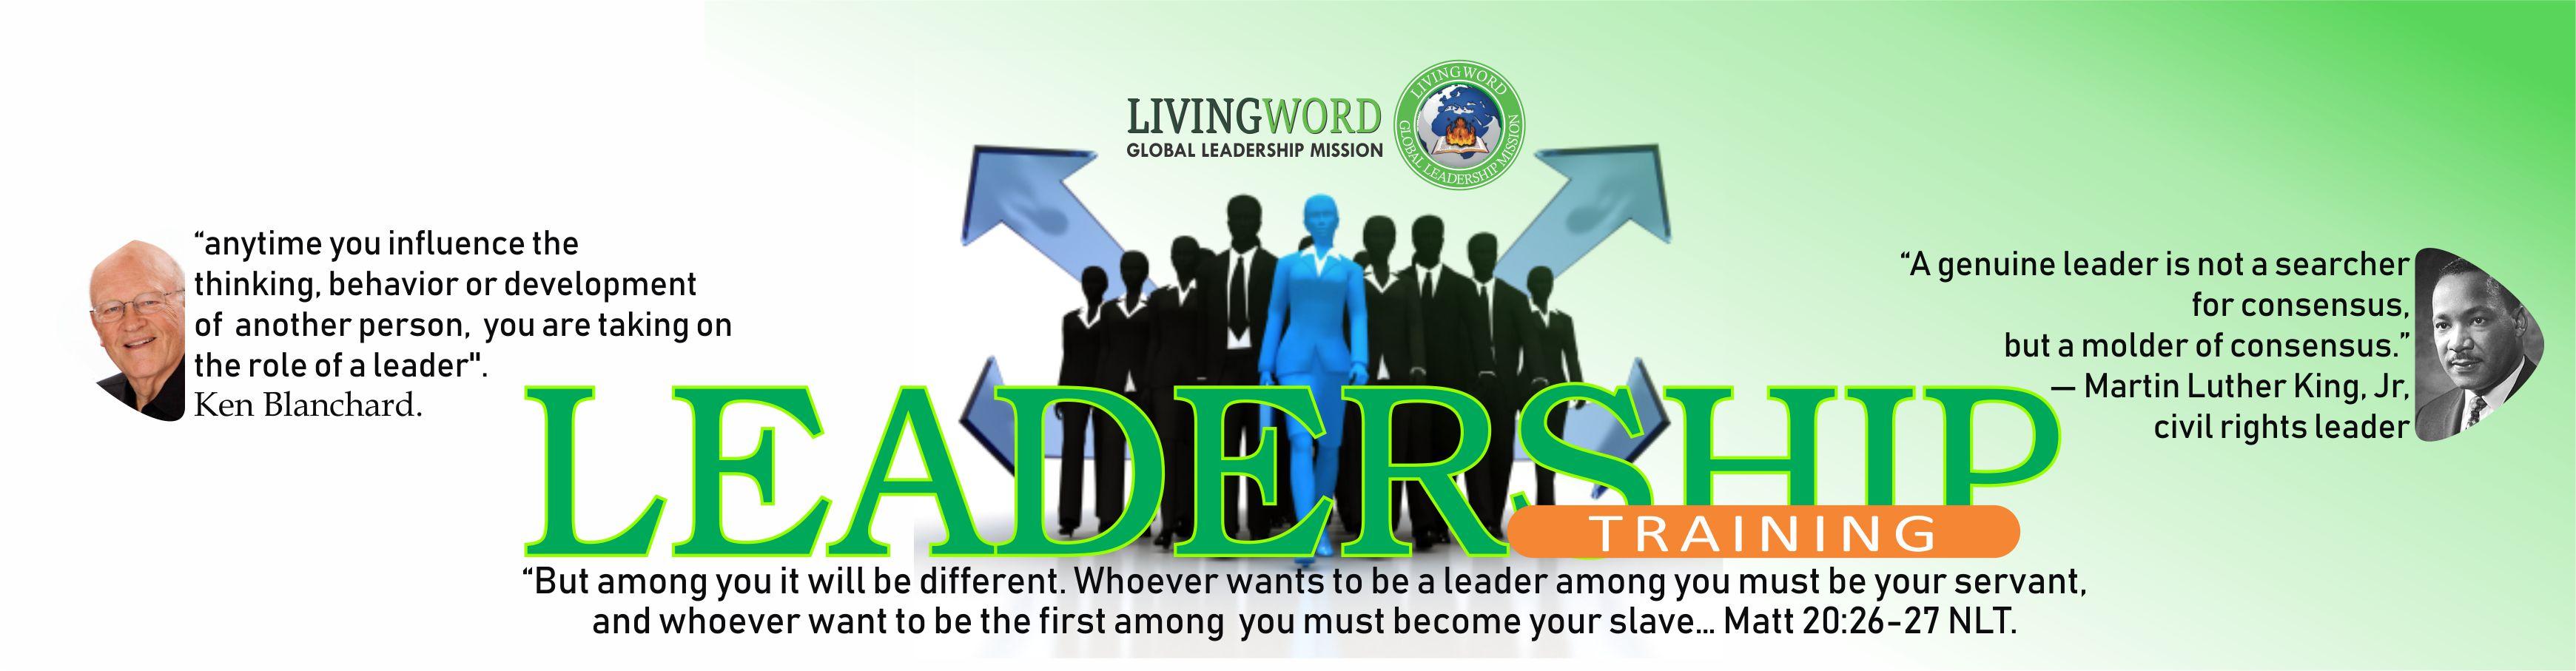 Leadership Encounter